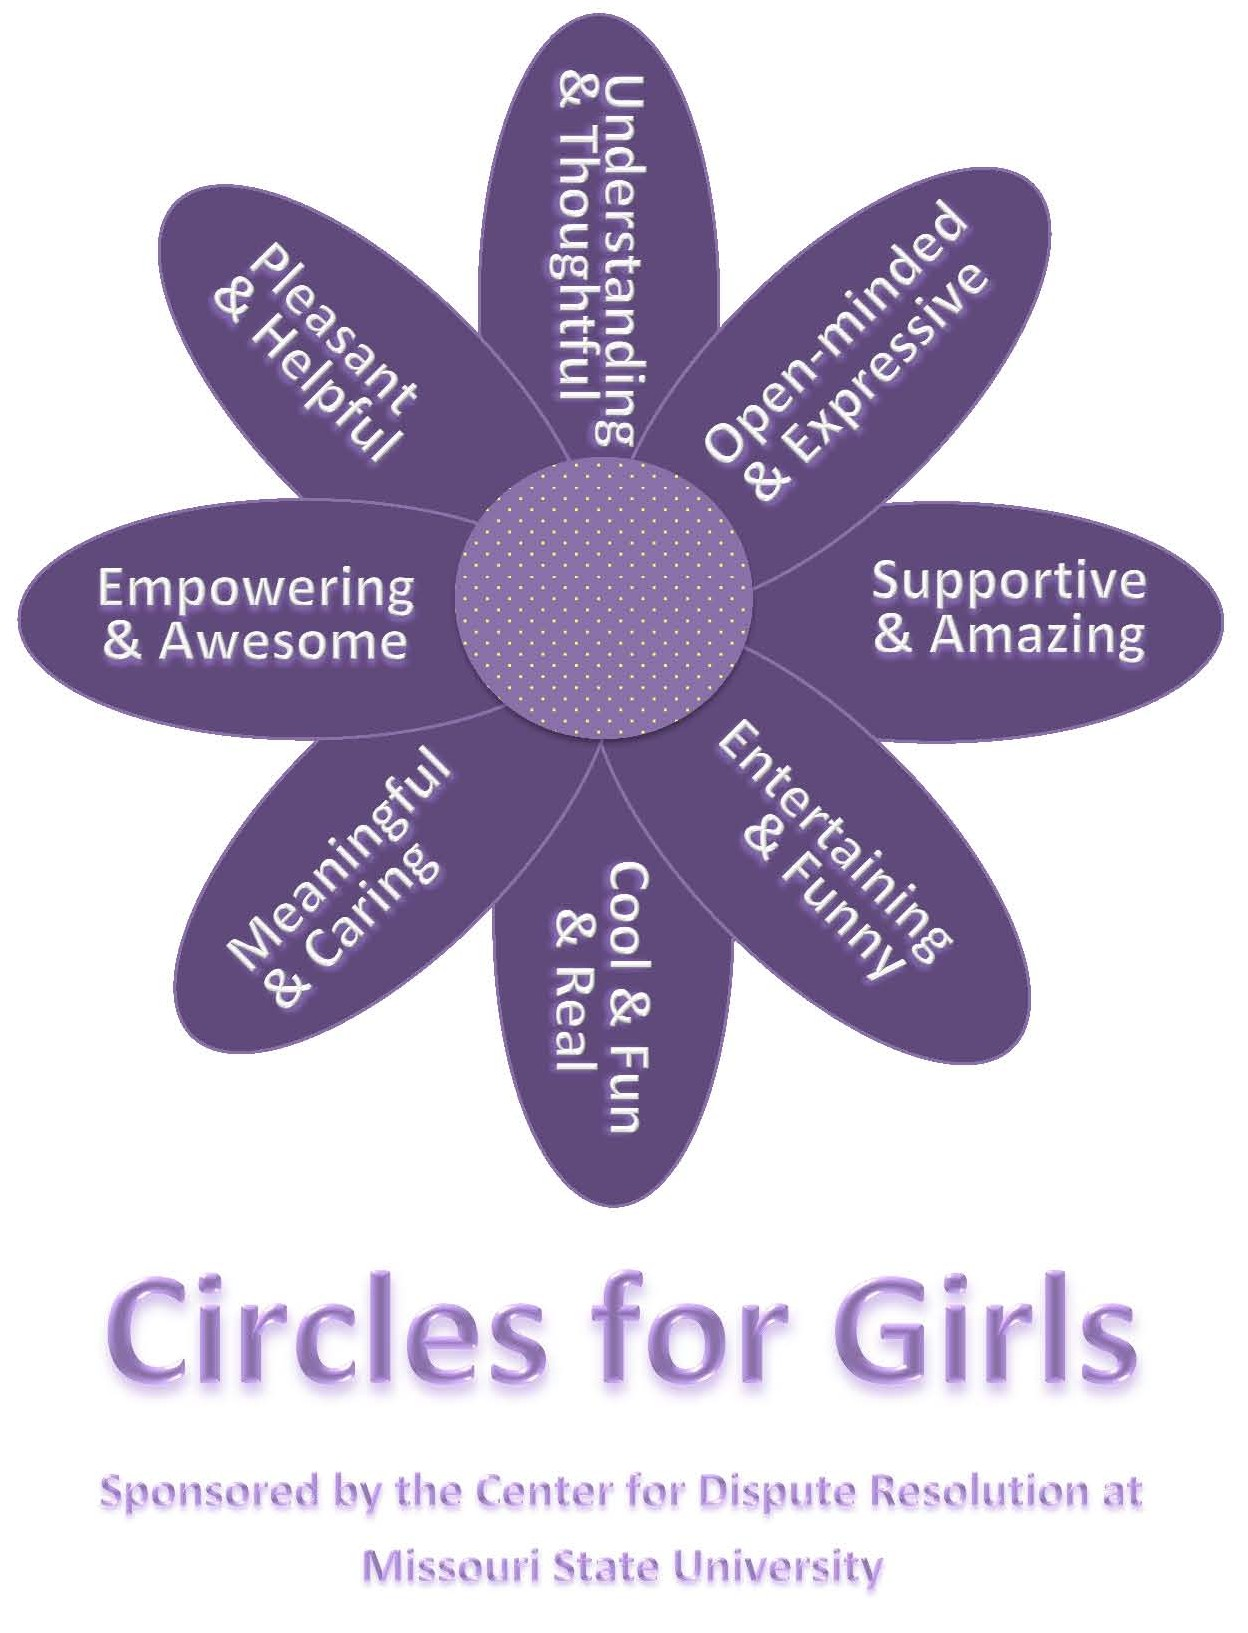 Circles for Girls Facilitator Training Coming Up